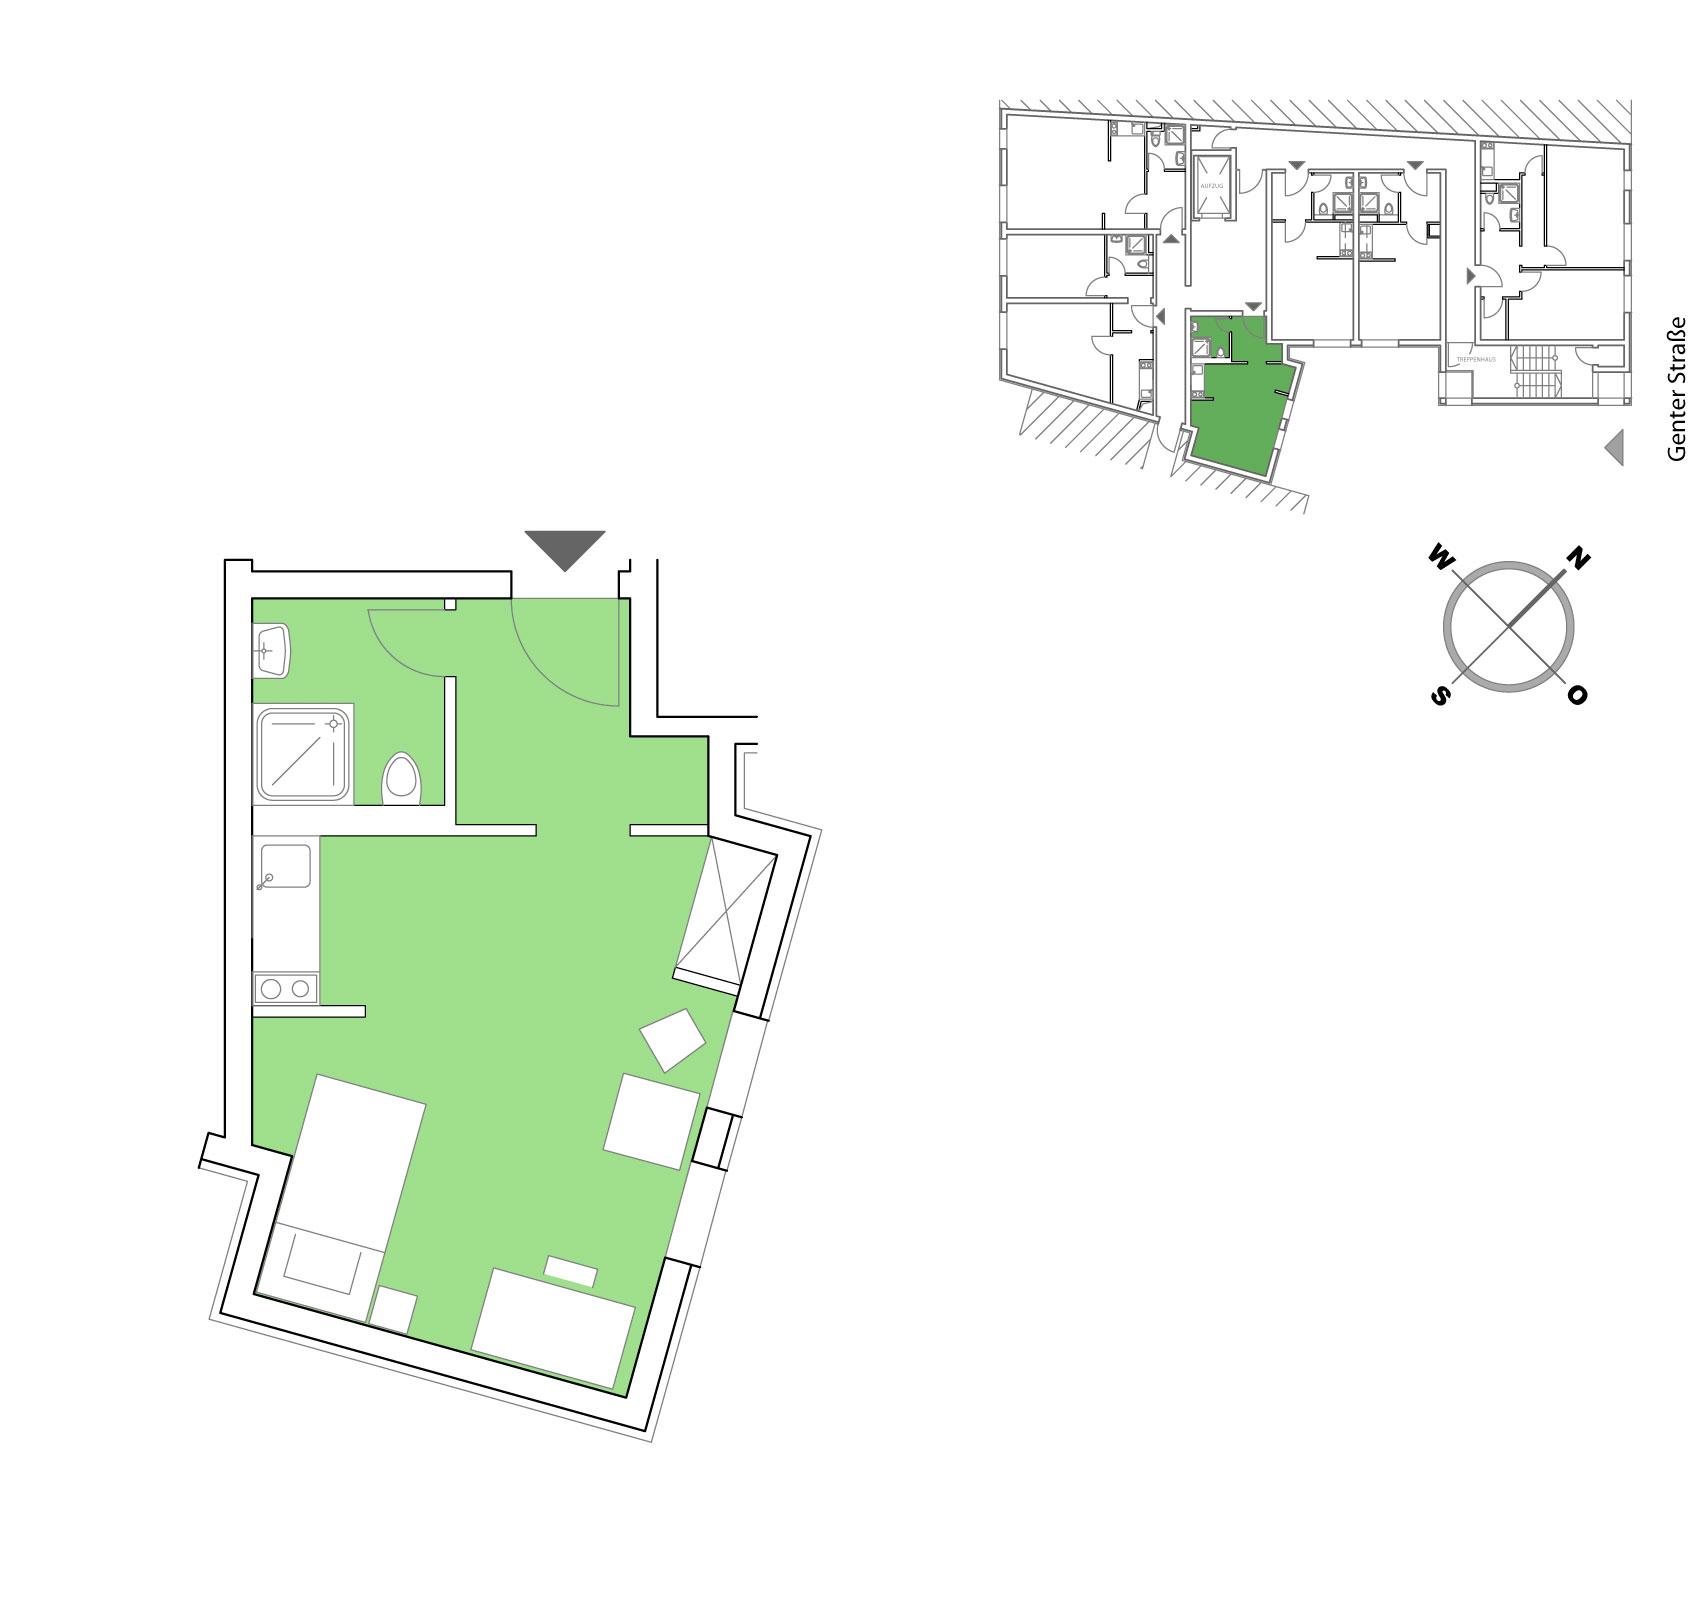 Grundriss Möblierte Apartments in Berlin 25,00 m²